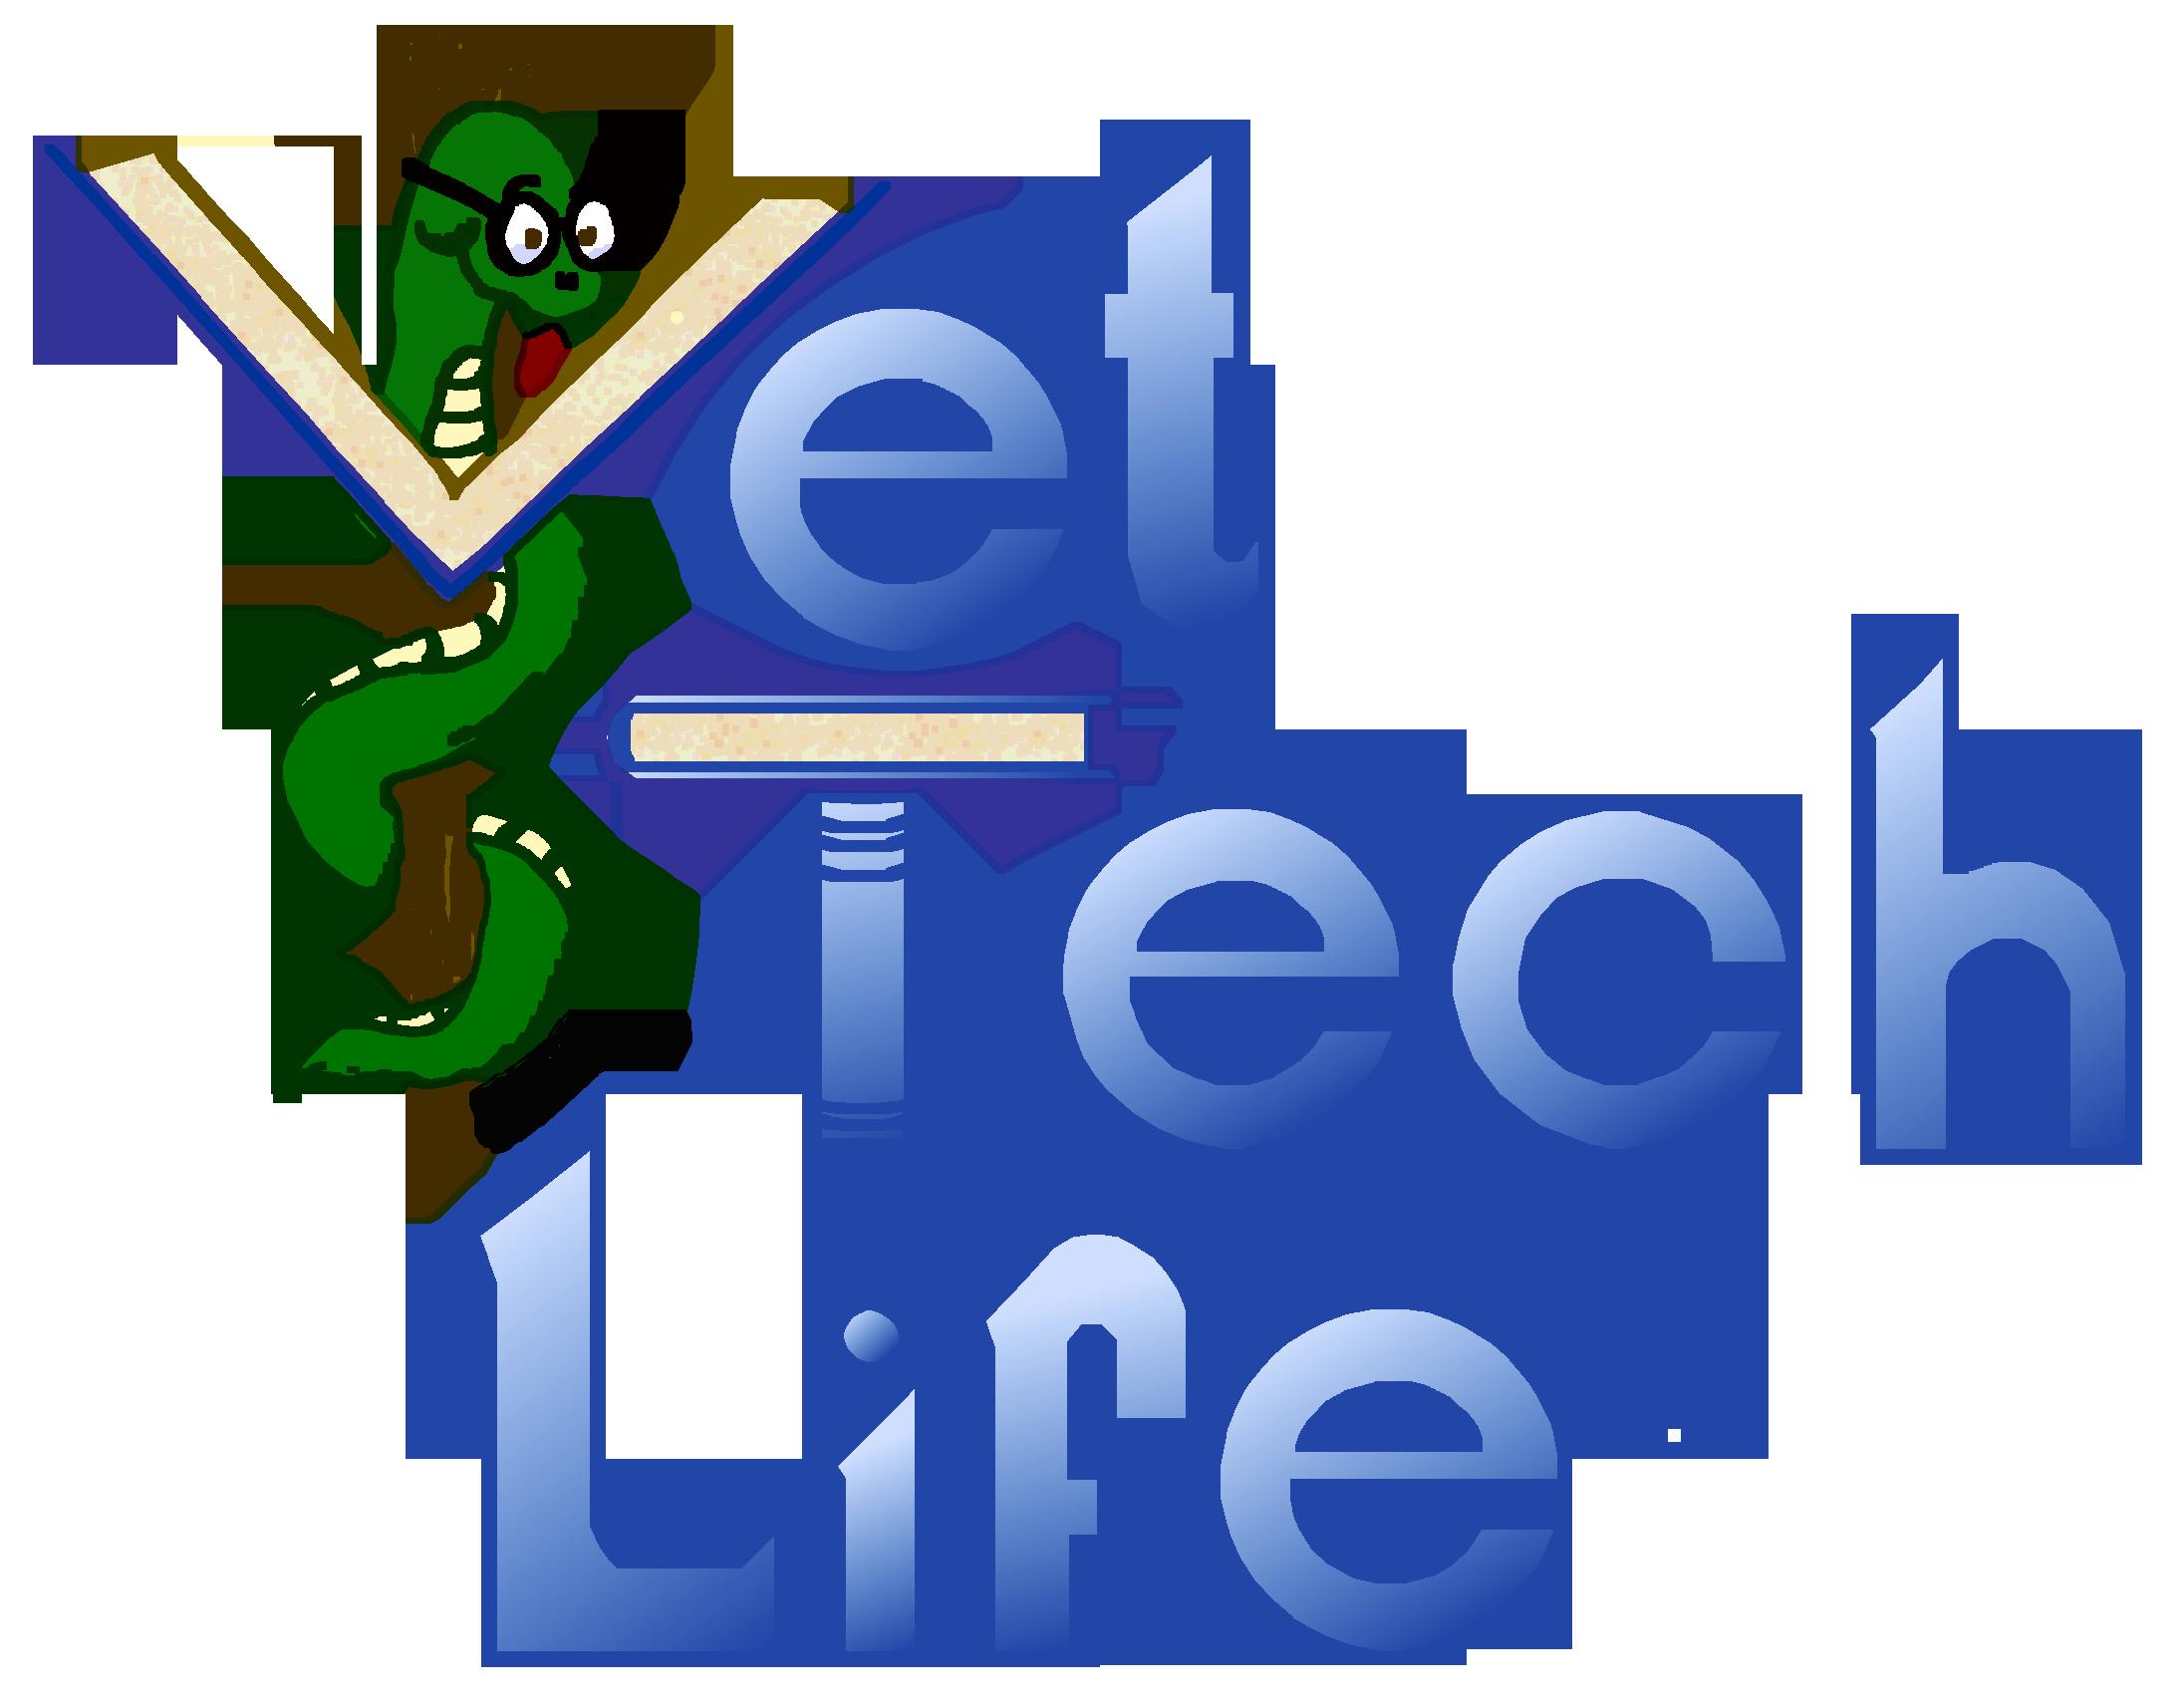 Flies clipart vets. Vettechlife article archives logo